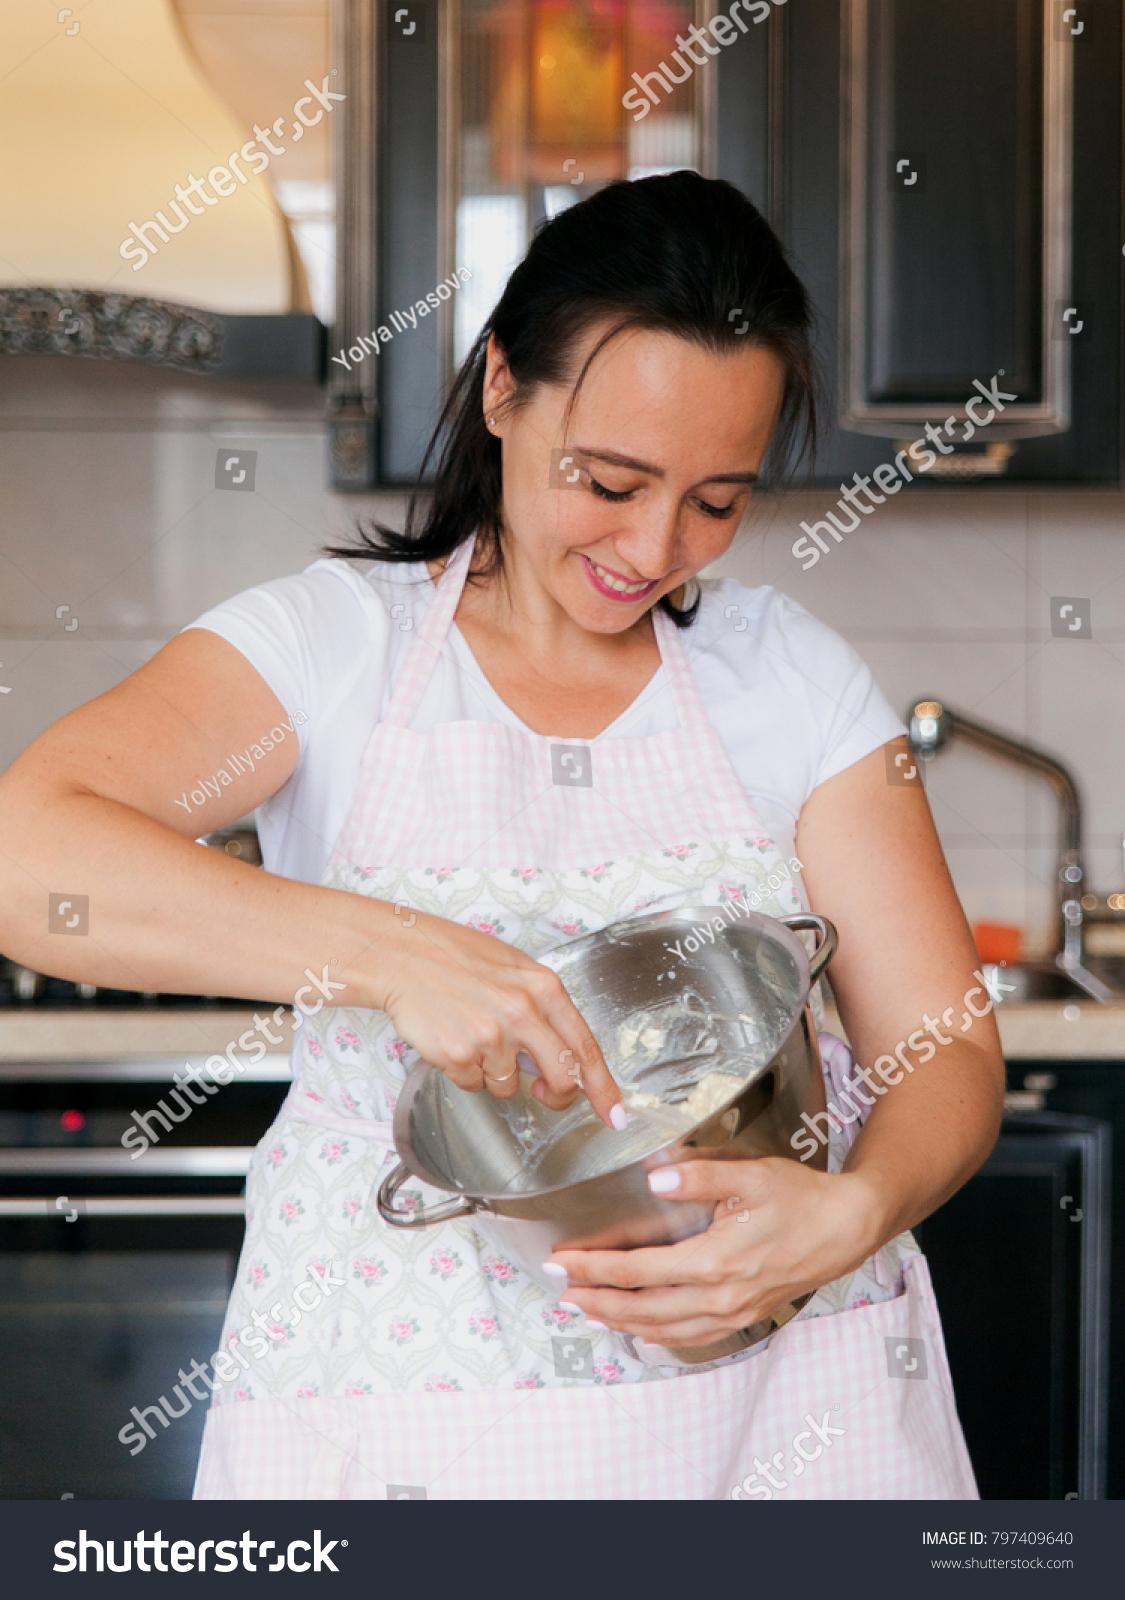 Woman on knees cunninglingus